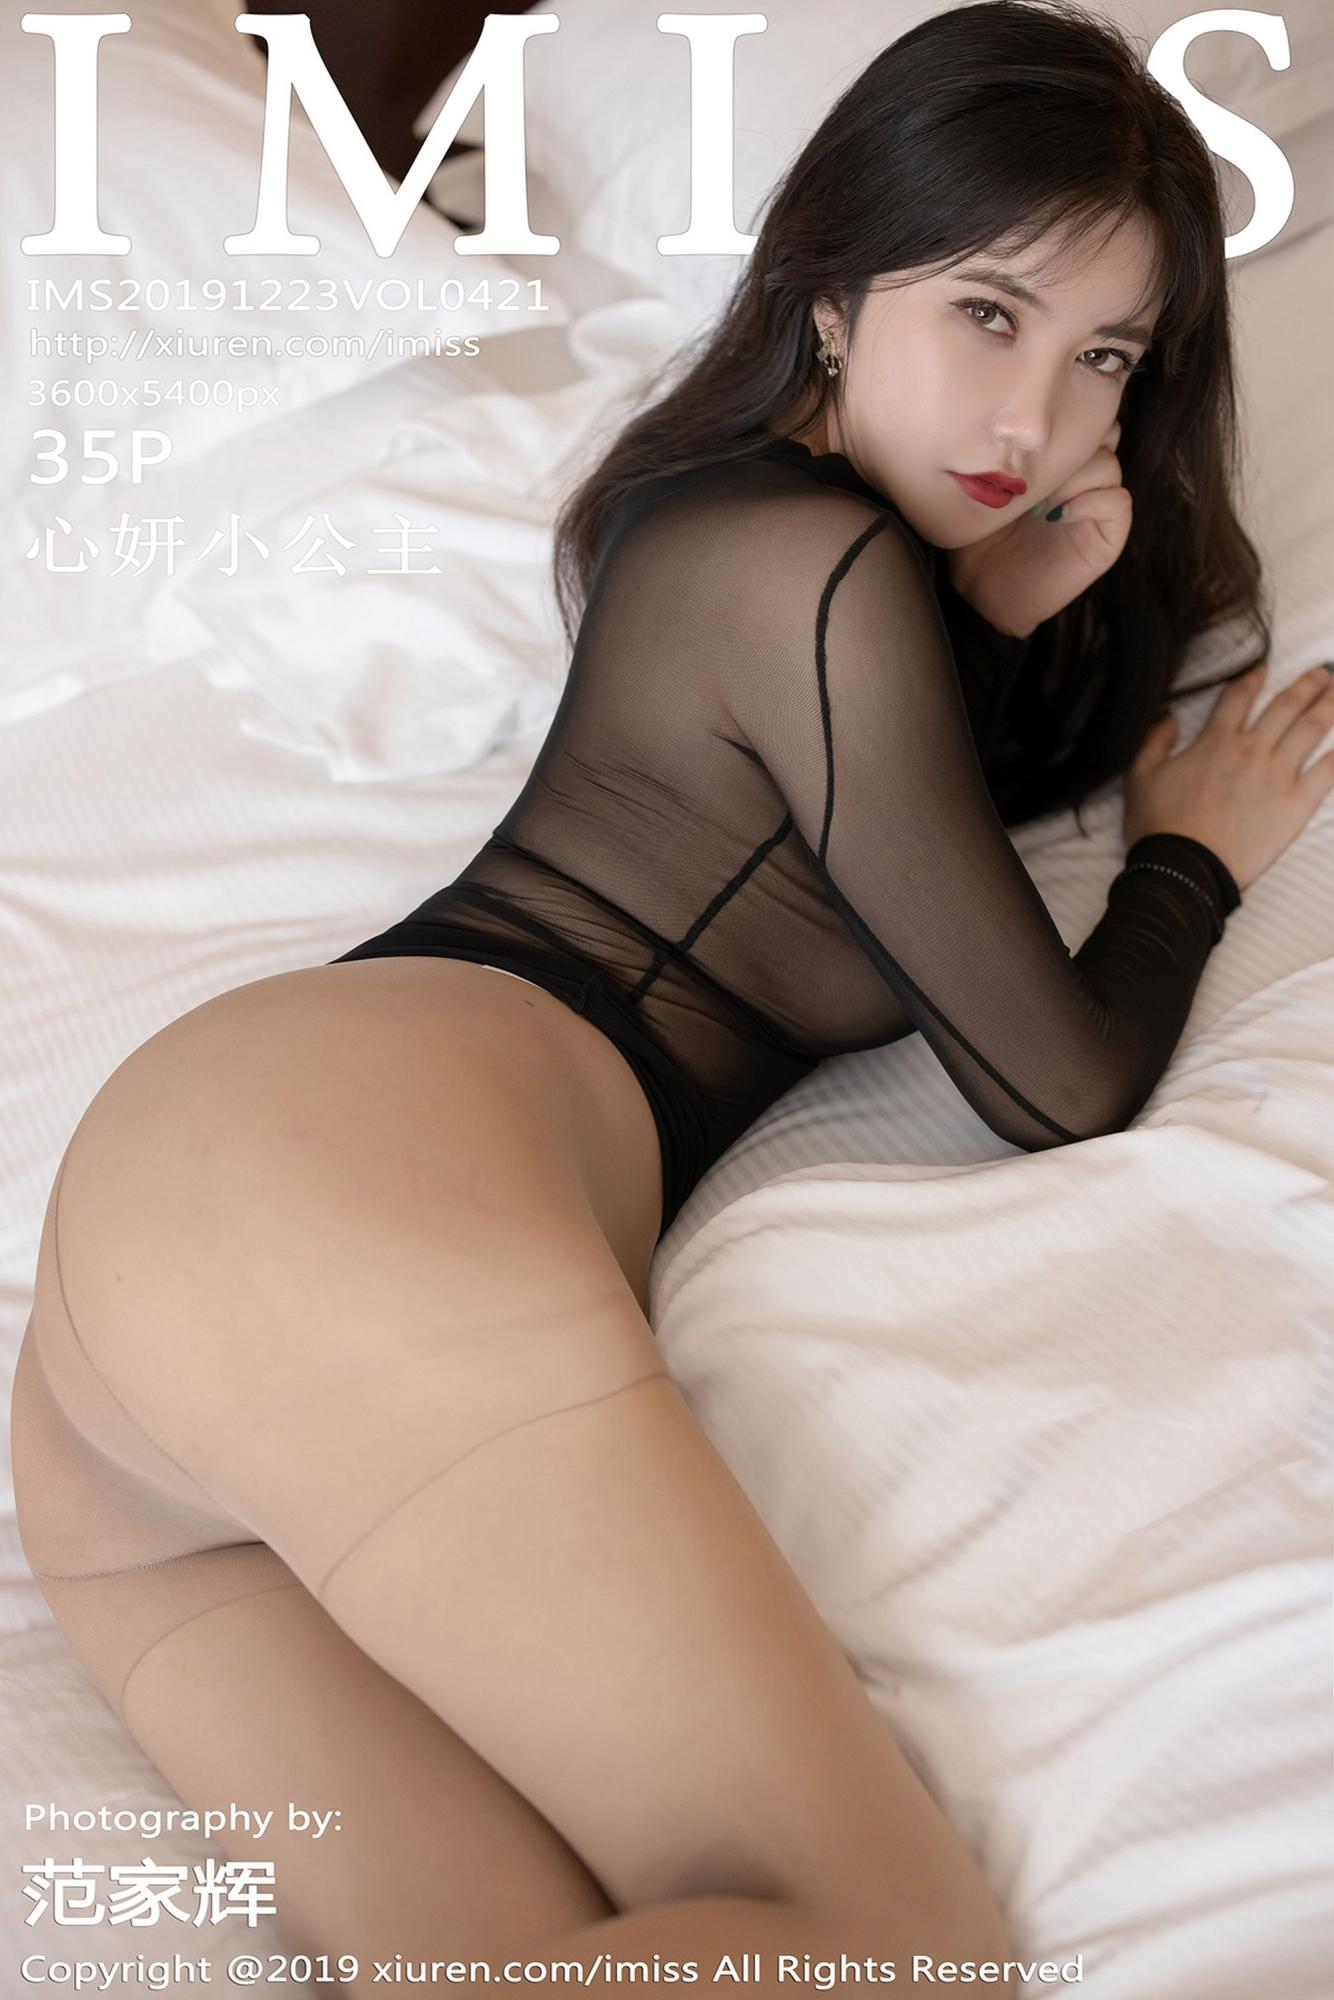 【IMiss愛蜜社系列】2019.12.23 VOL.421 心妍小公主 性感寫真 - 貼圖 - 清涼寫真 -